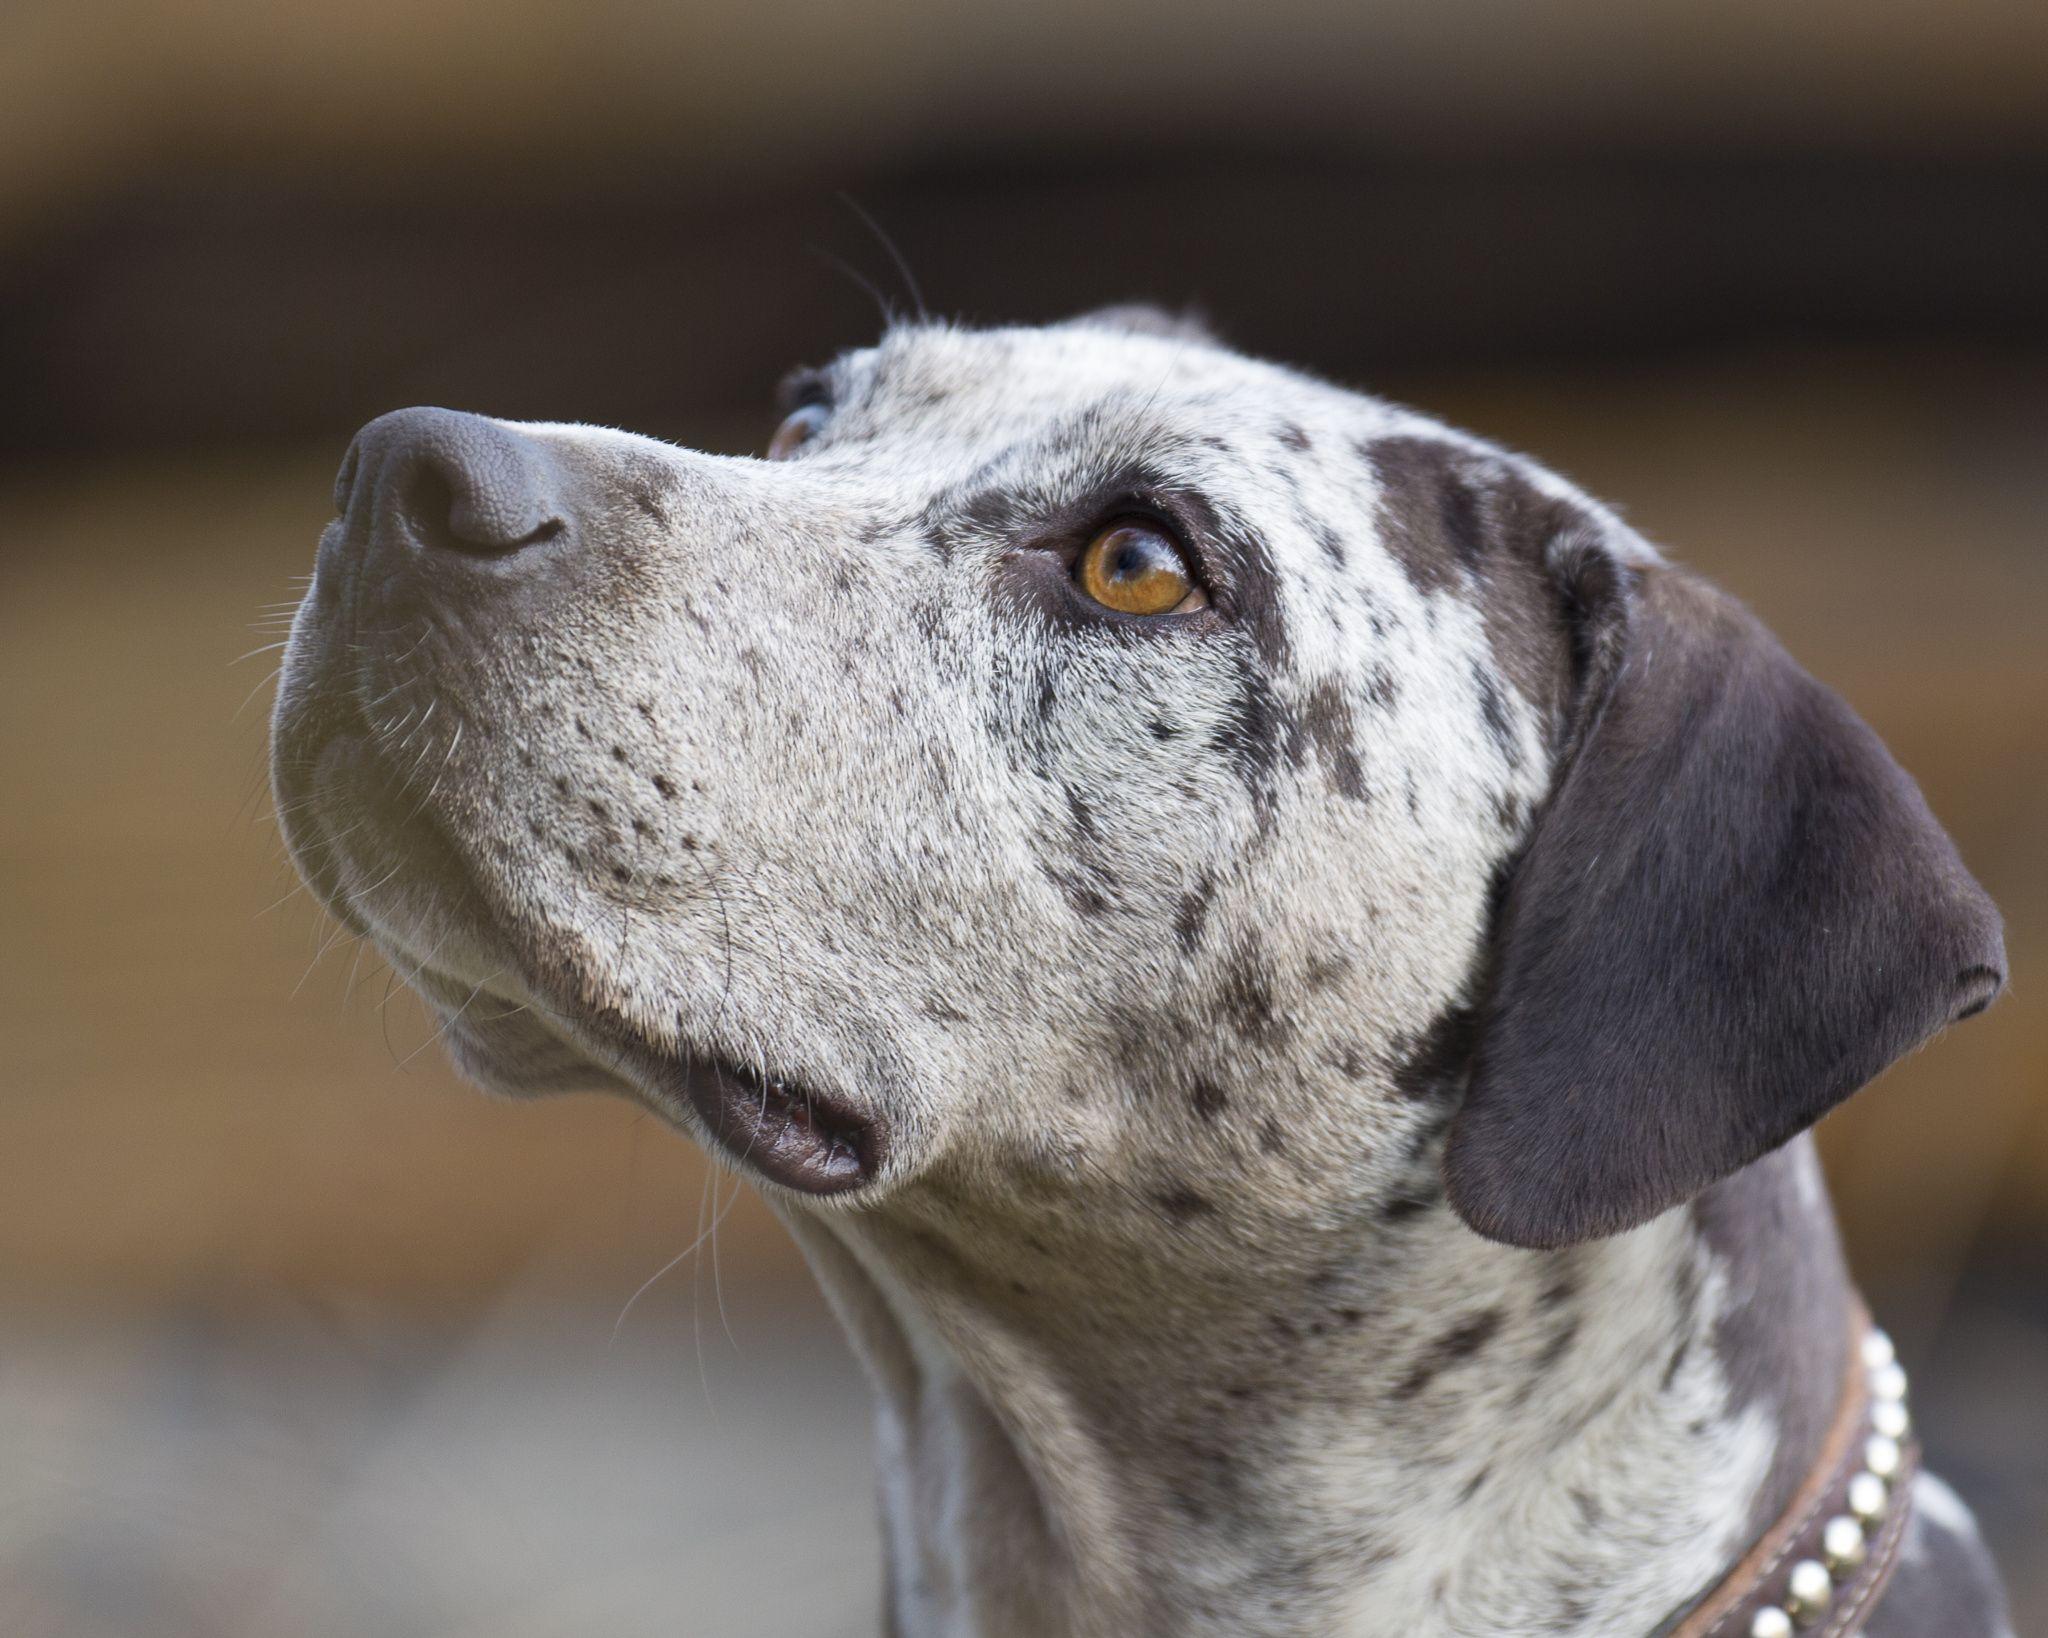 ᐉ леопардовая собака катахулы описание породы - zoomanji.ru